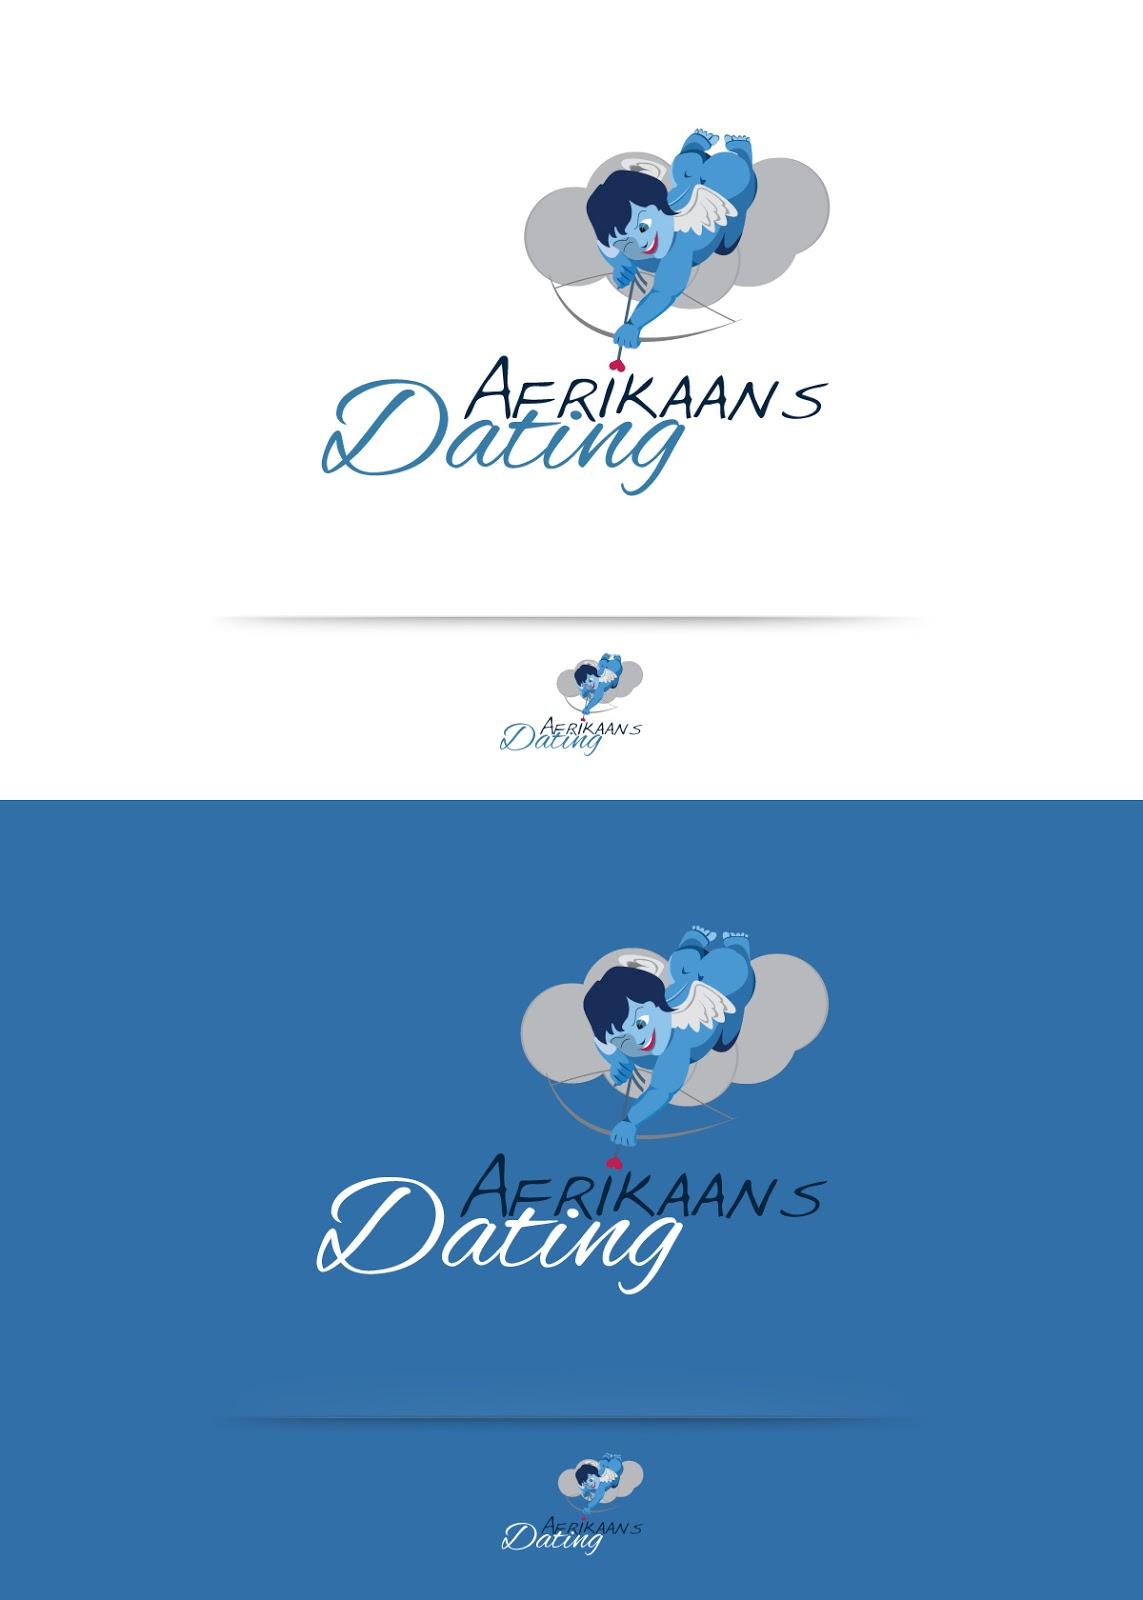 Afrikaans online dating